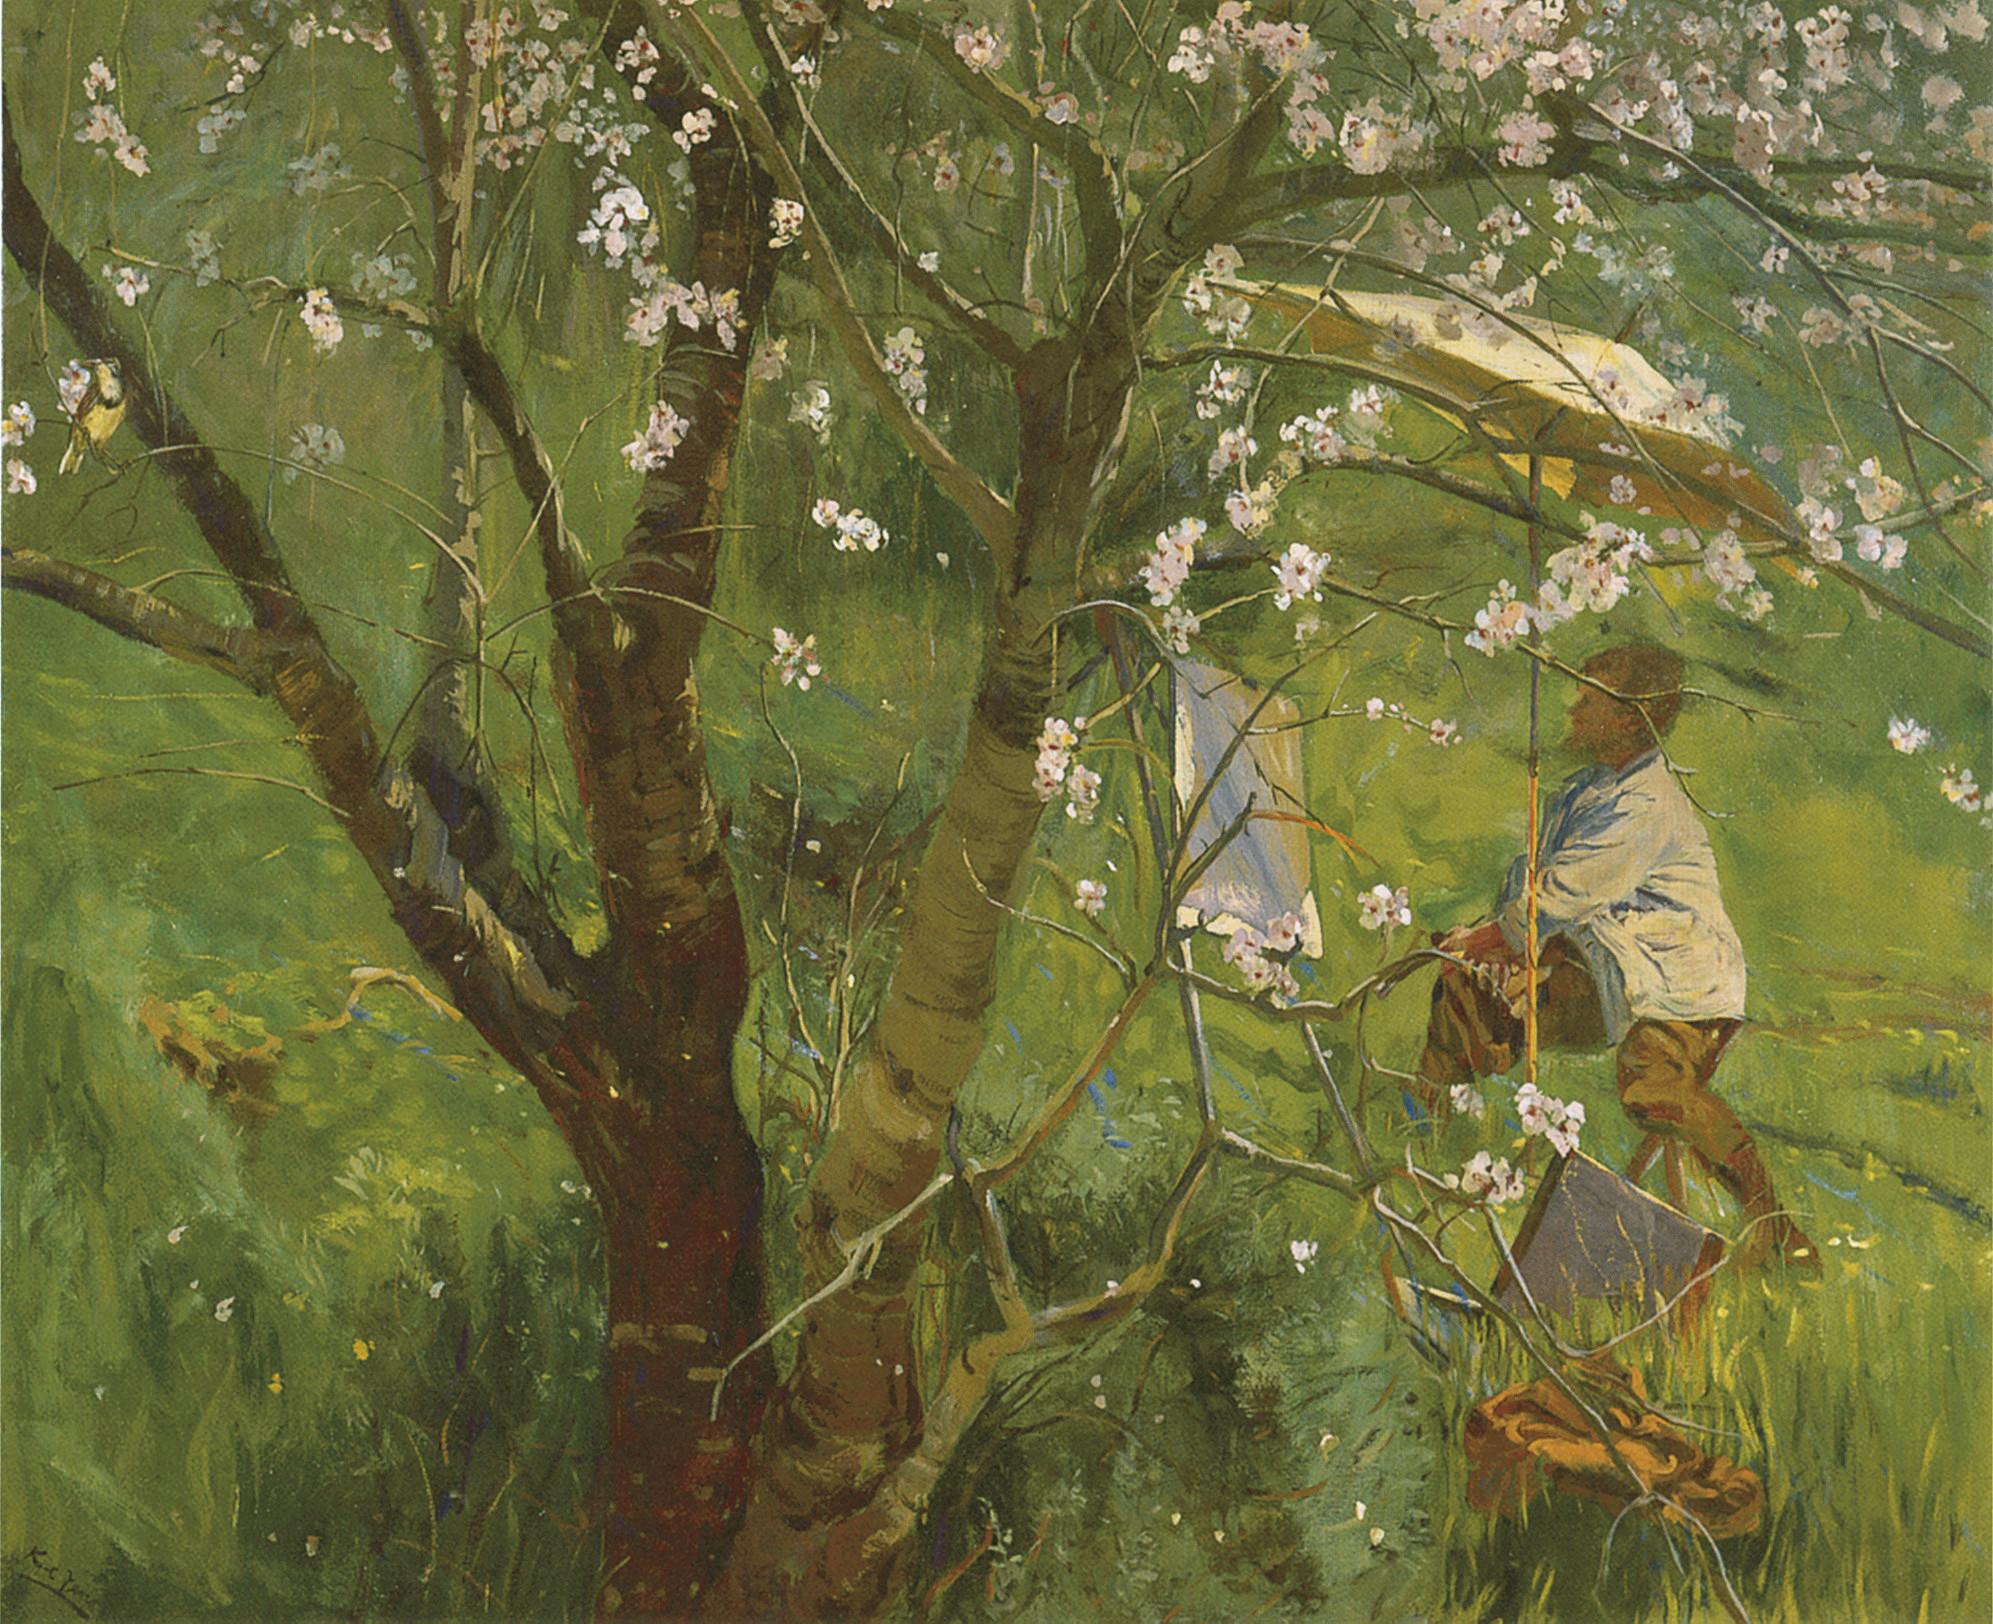 Karl Yens (1868-1945)